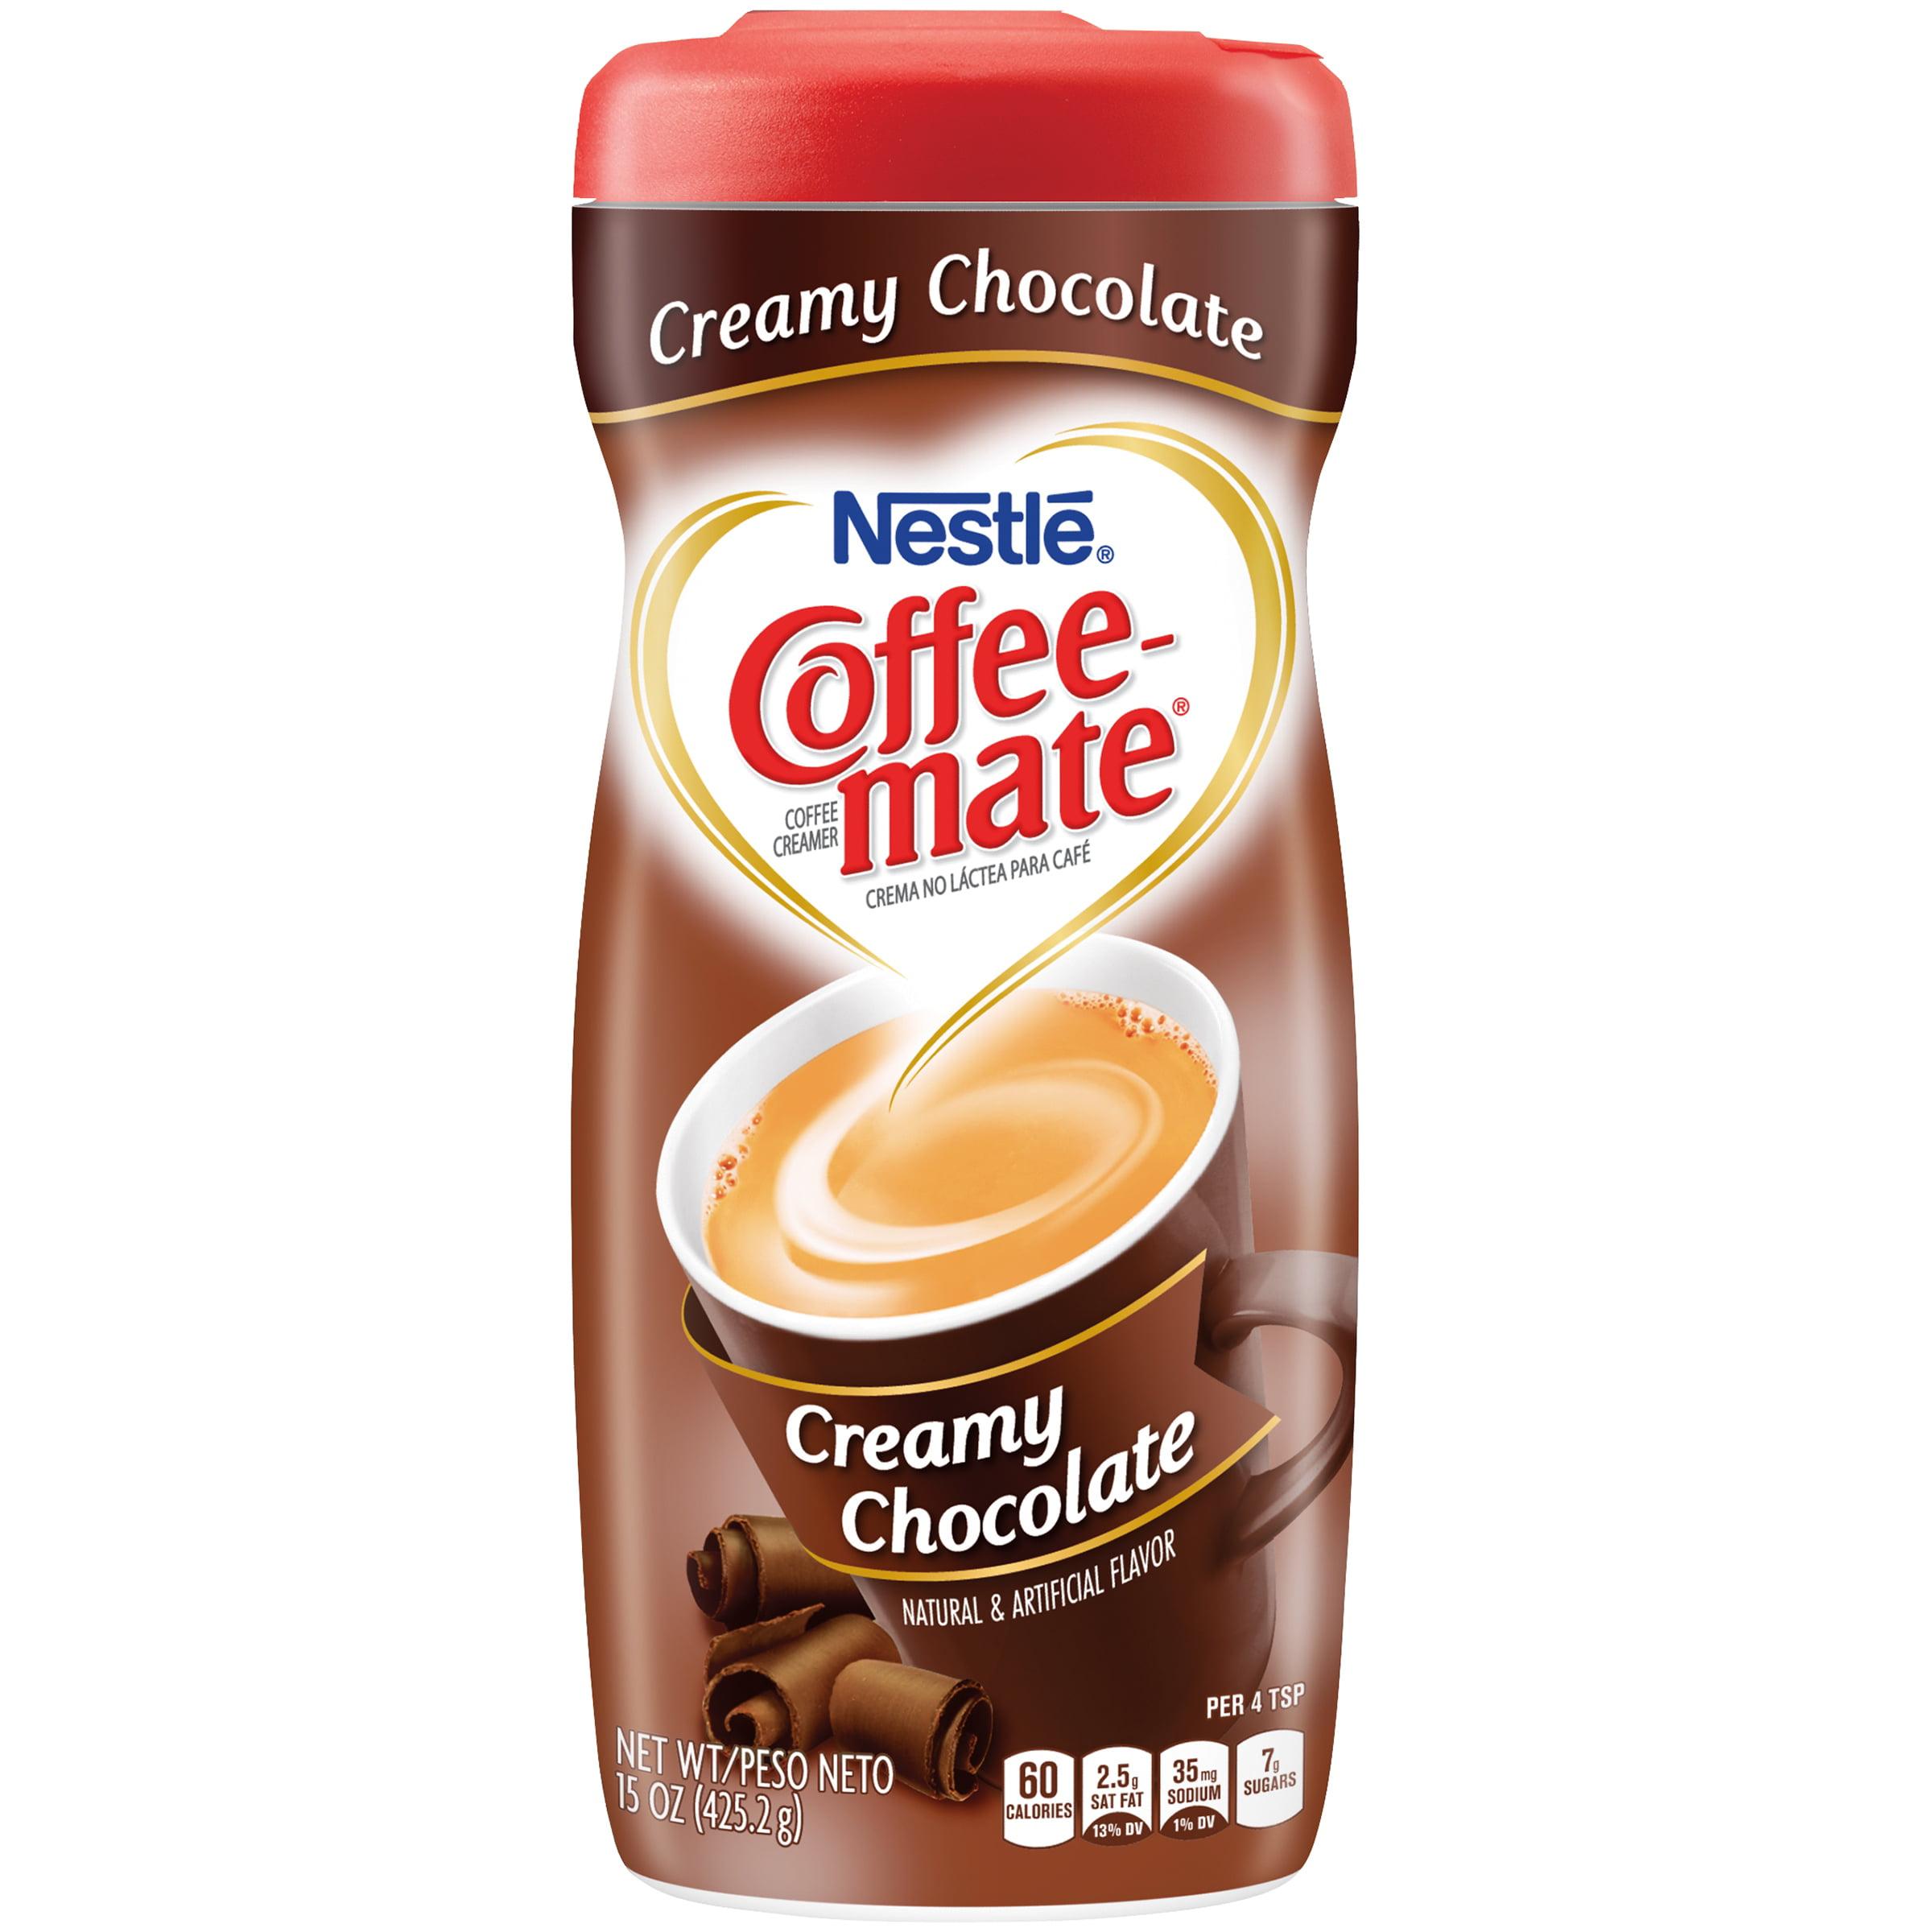 Nestle Coffeemate Creamy Chocolate Powder Coffee Creamer 15 oz ...